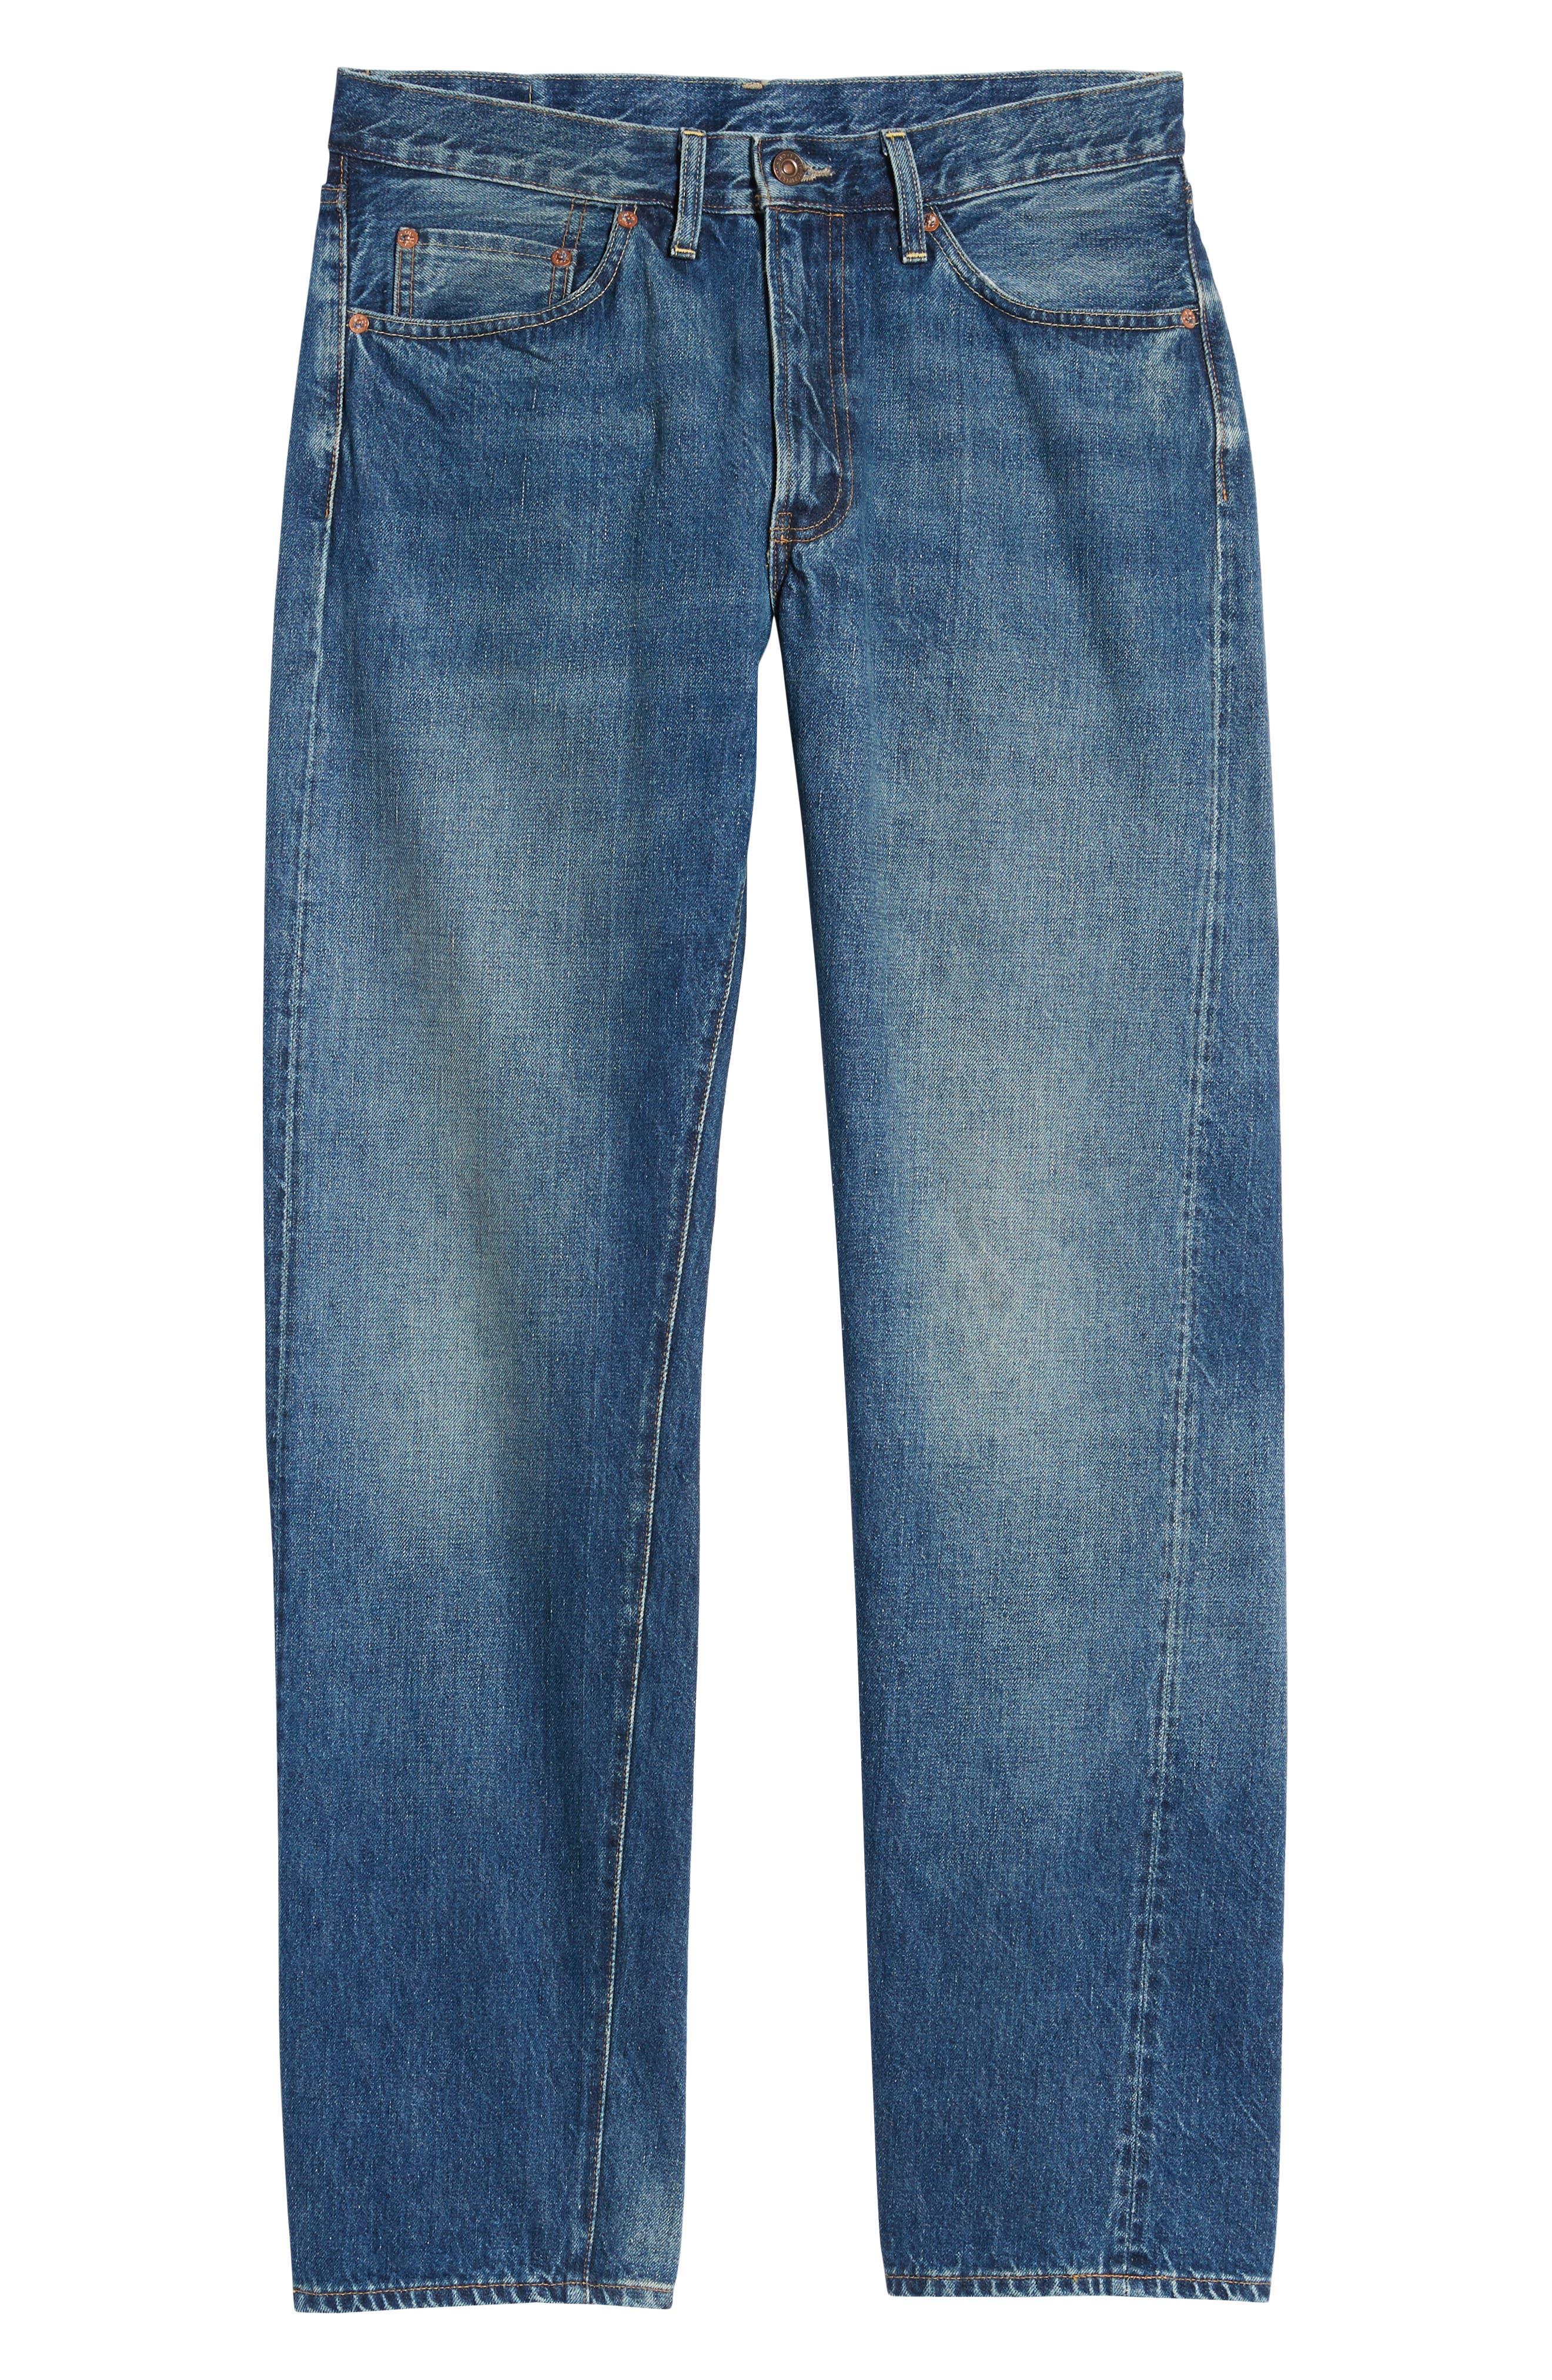 LEVI'S<SUP>®</SUP> VINTAGE CLOTHING, 1954 501<sup>®</sup> Straight Leg Jeans, Alternate thumbnail 7, color, PINWHEEL